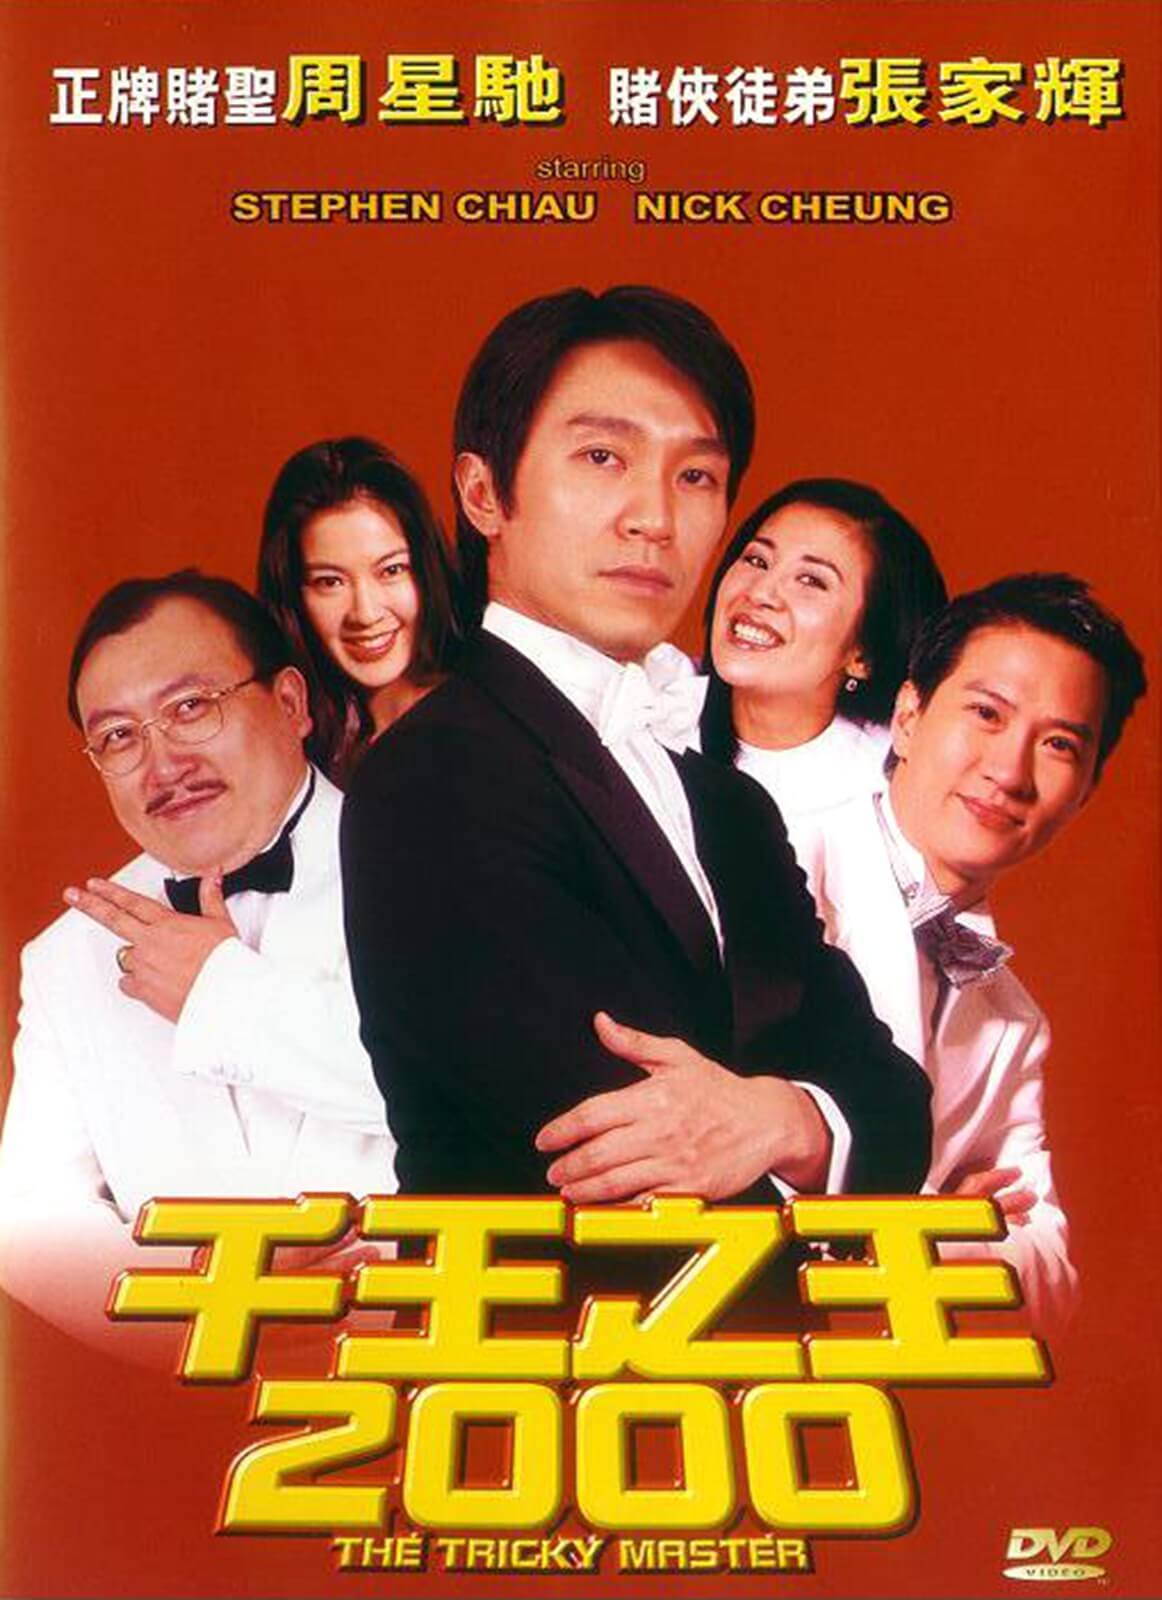 bip vuong - the tricky master 2000 thuyet minh